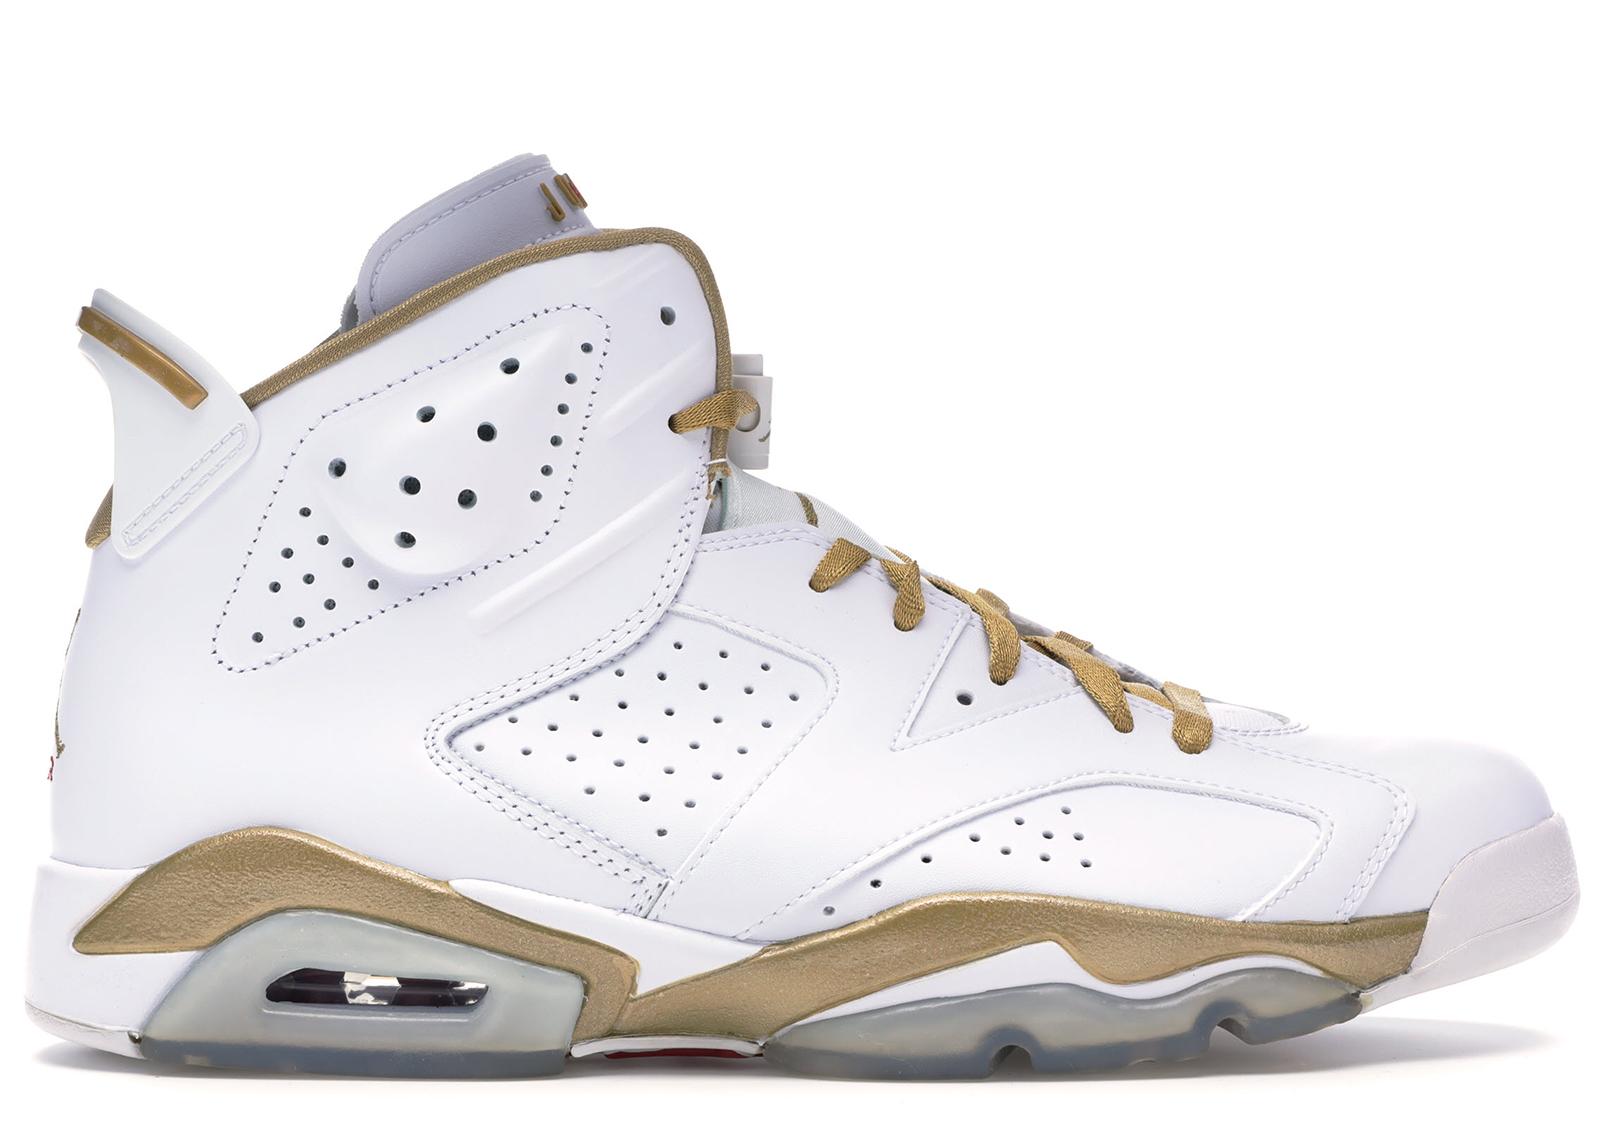 Jordan 6 Retro Golden Moments Pack (6)